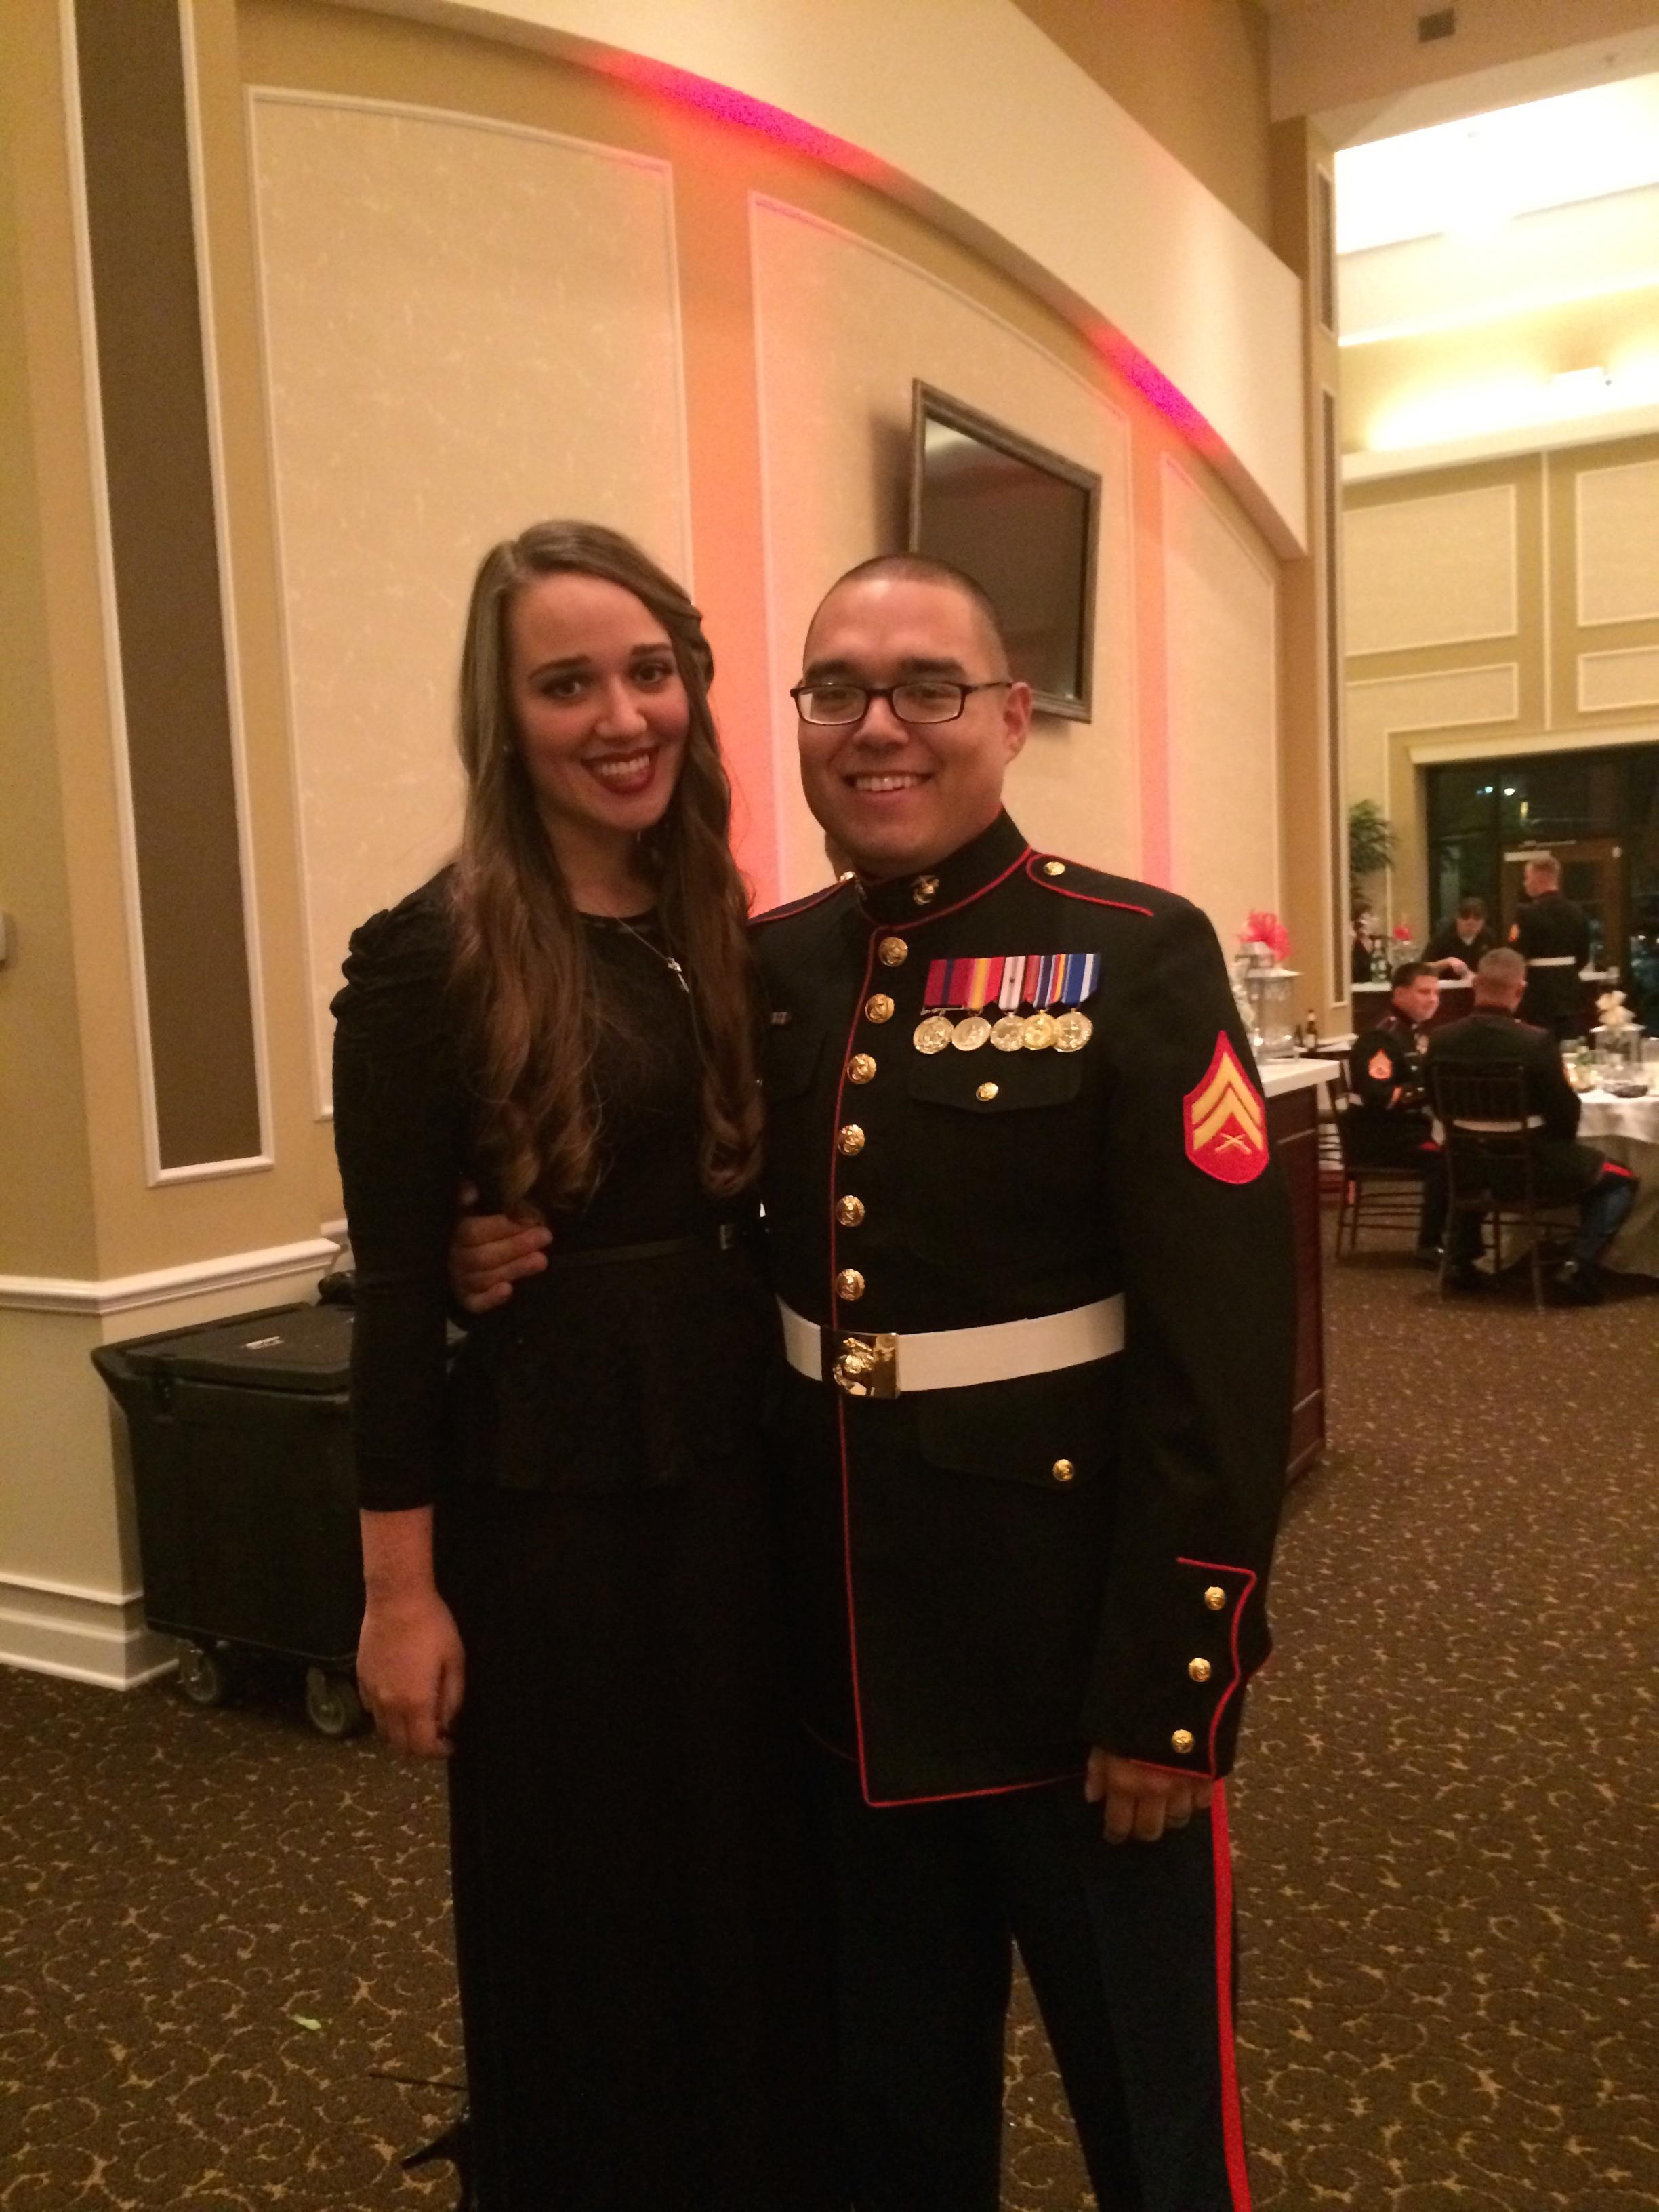 November 2014, Augusta, Georgia. Our second Marine Corps Ball.